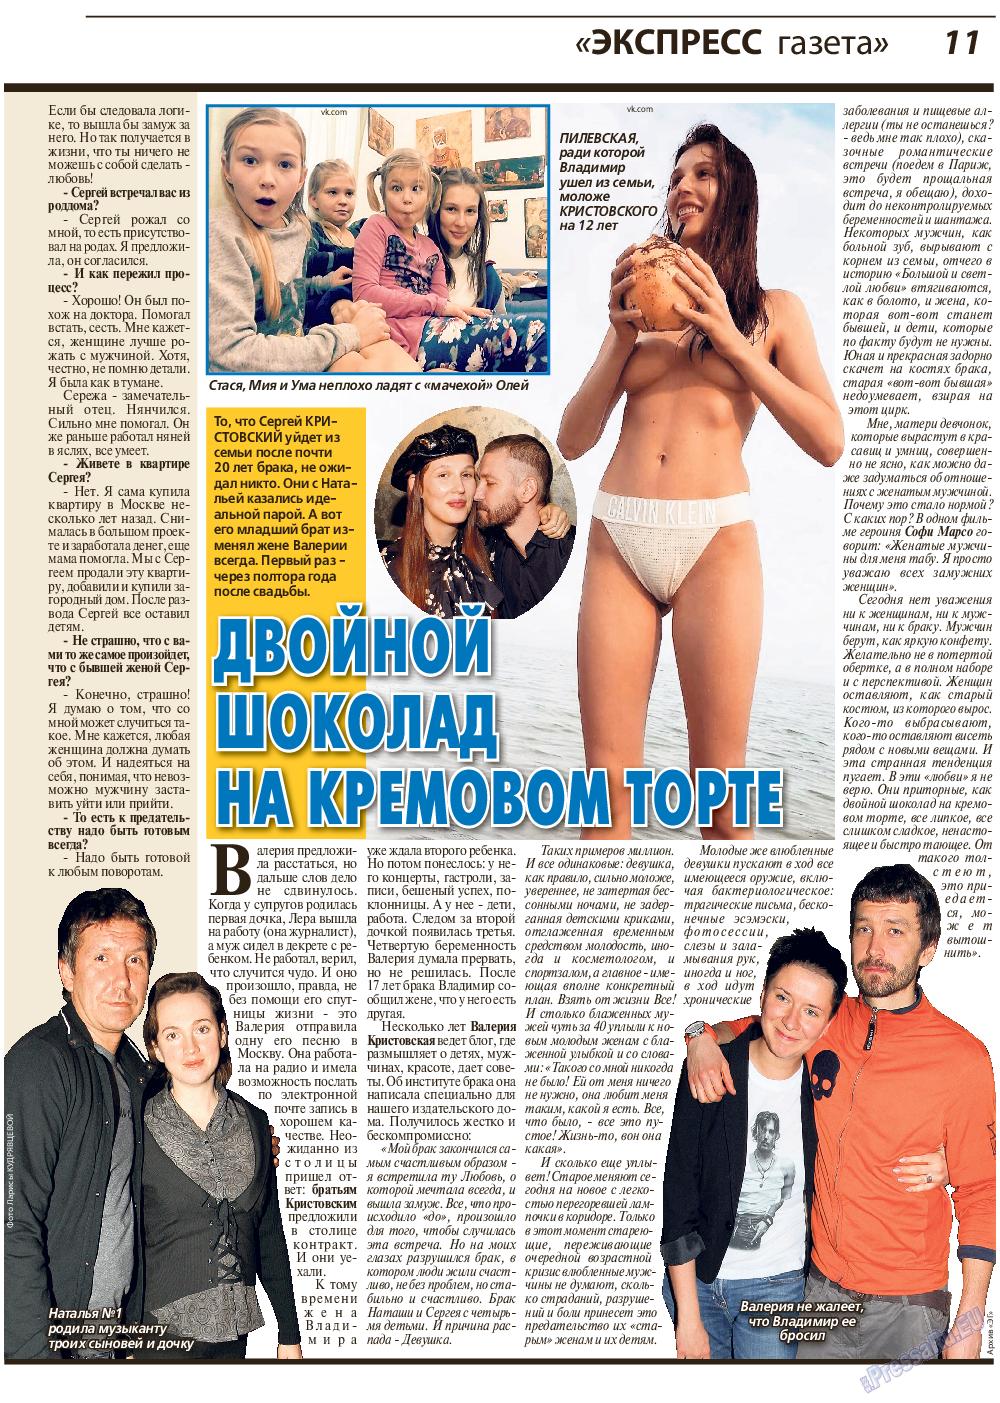 Экспресс газета (газета). 2018 год, номер 6, стр. 11